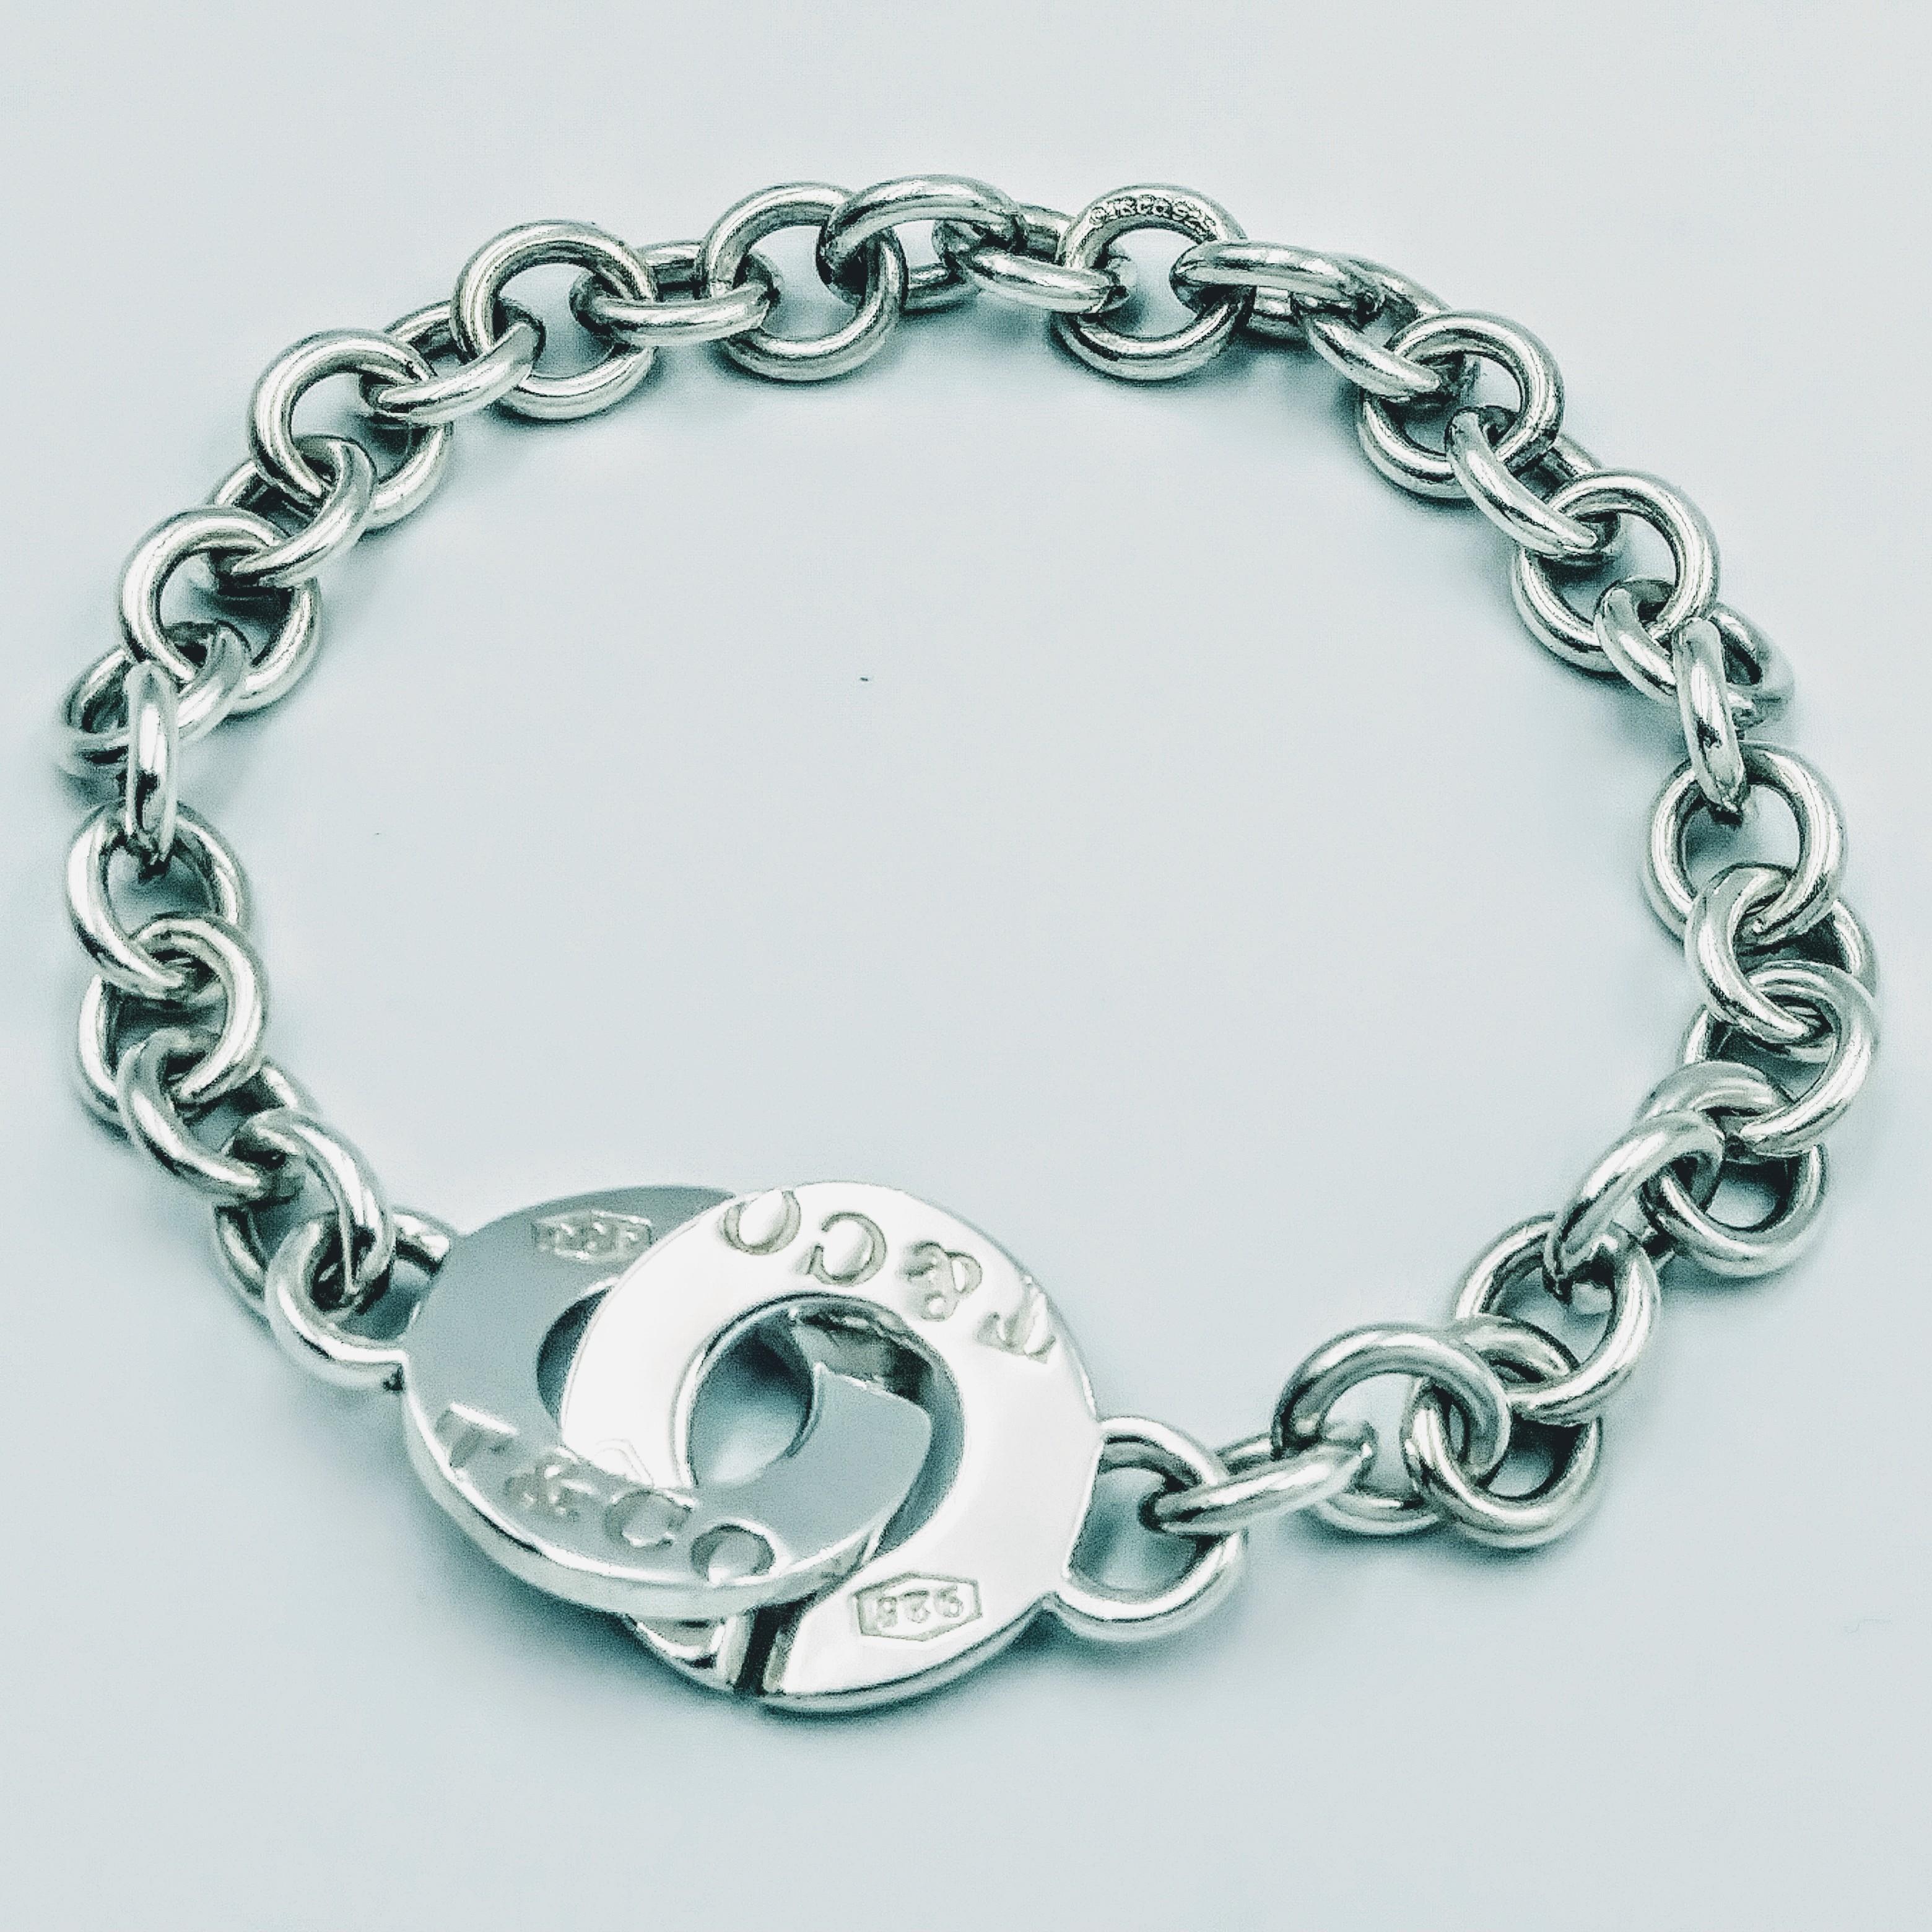 <b>Tiffany & Co.</b> Tiffany & Co 1837 Interlocking Circles Sterling Silver Bracelet 8.5